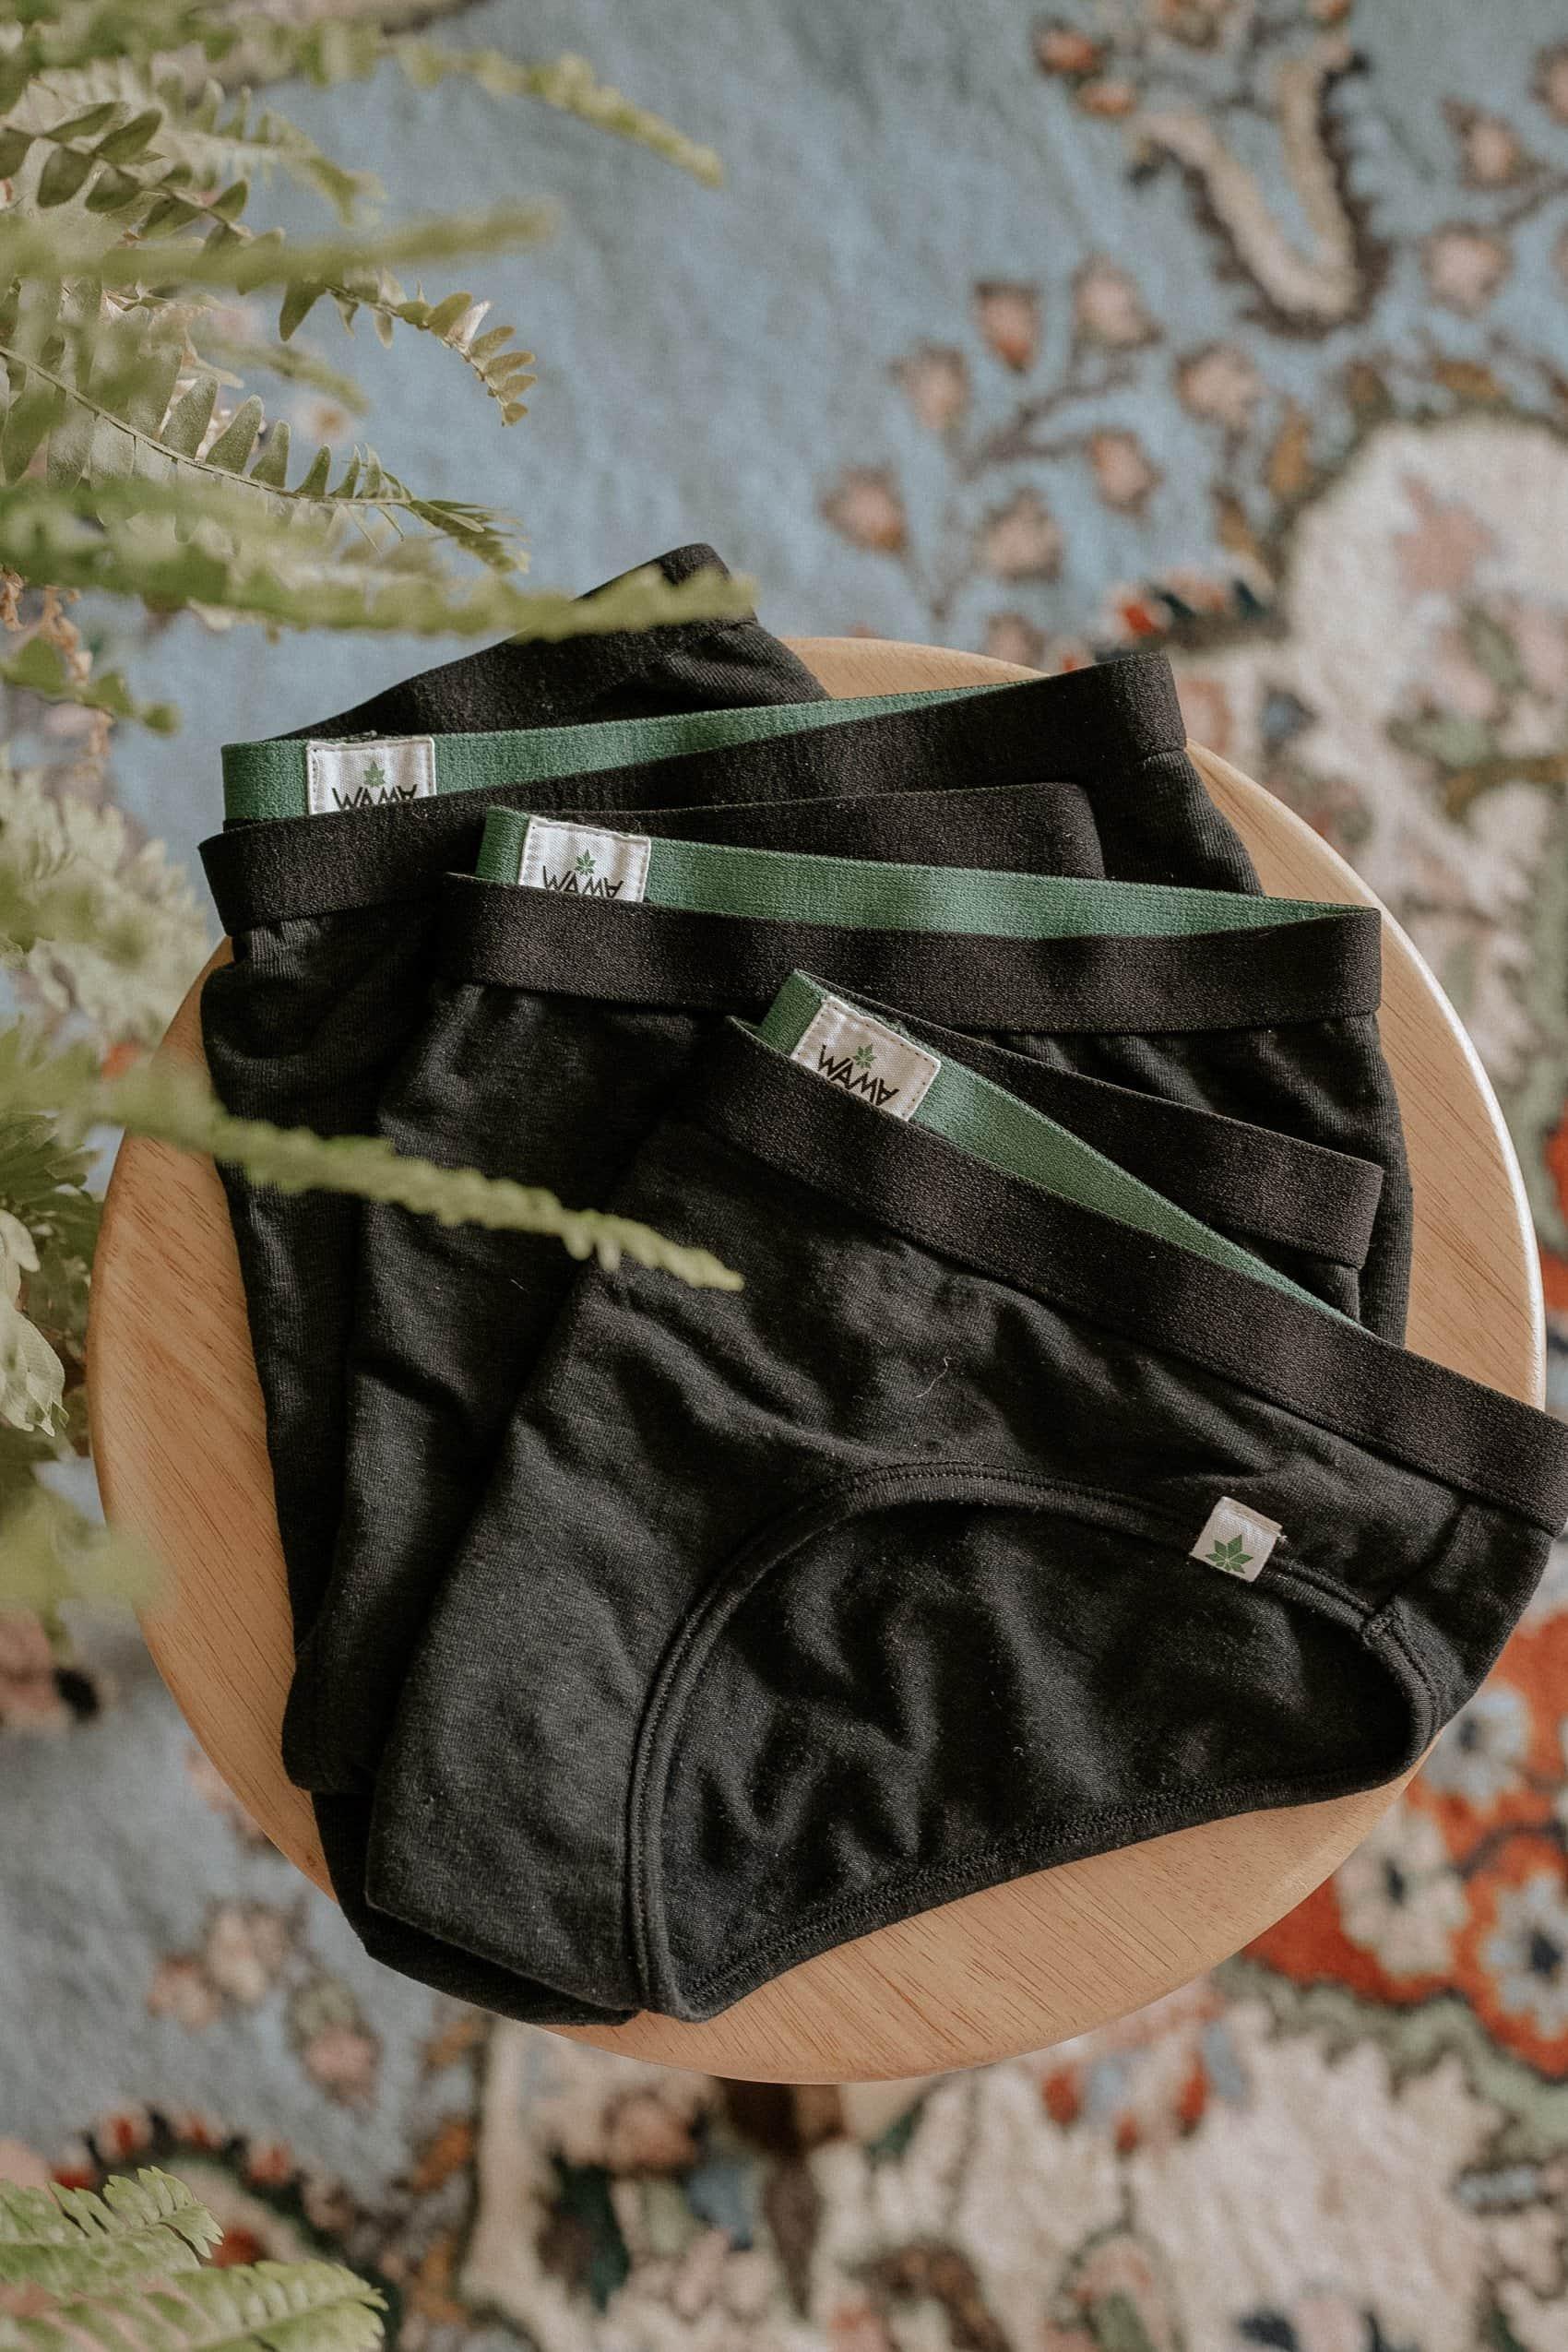 WAMA Sustainable Hemp Underwear Review